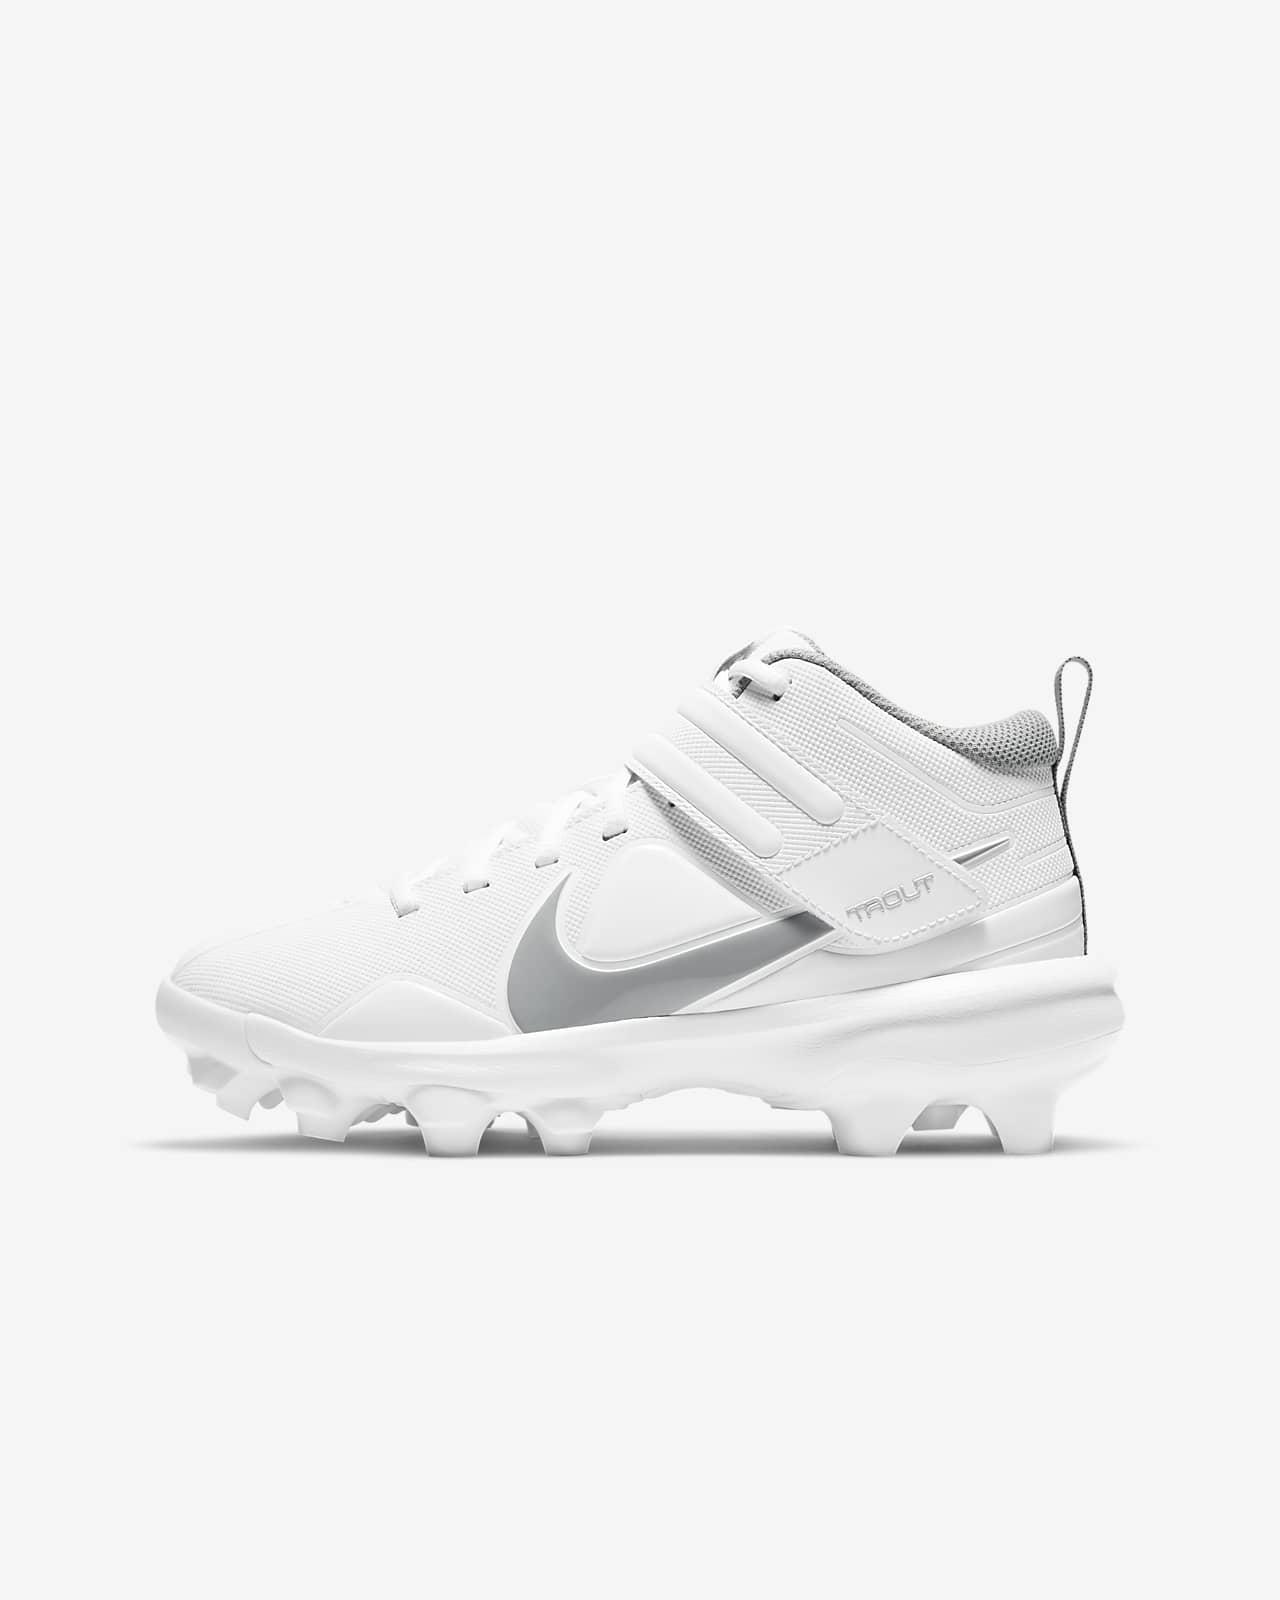 Nike Force Trout 7 Pro MCS Big Kids' Baseball Cleats